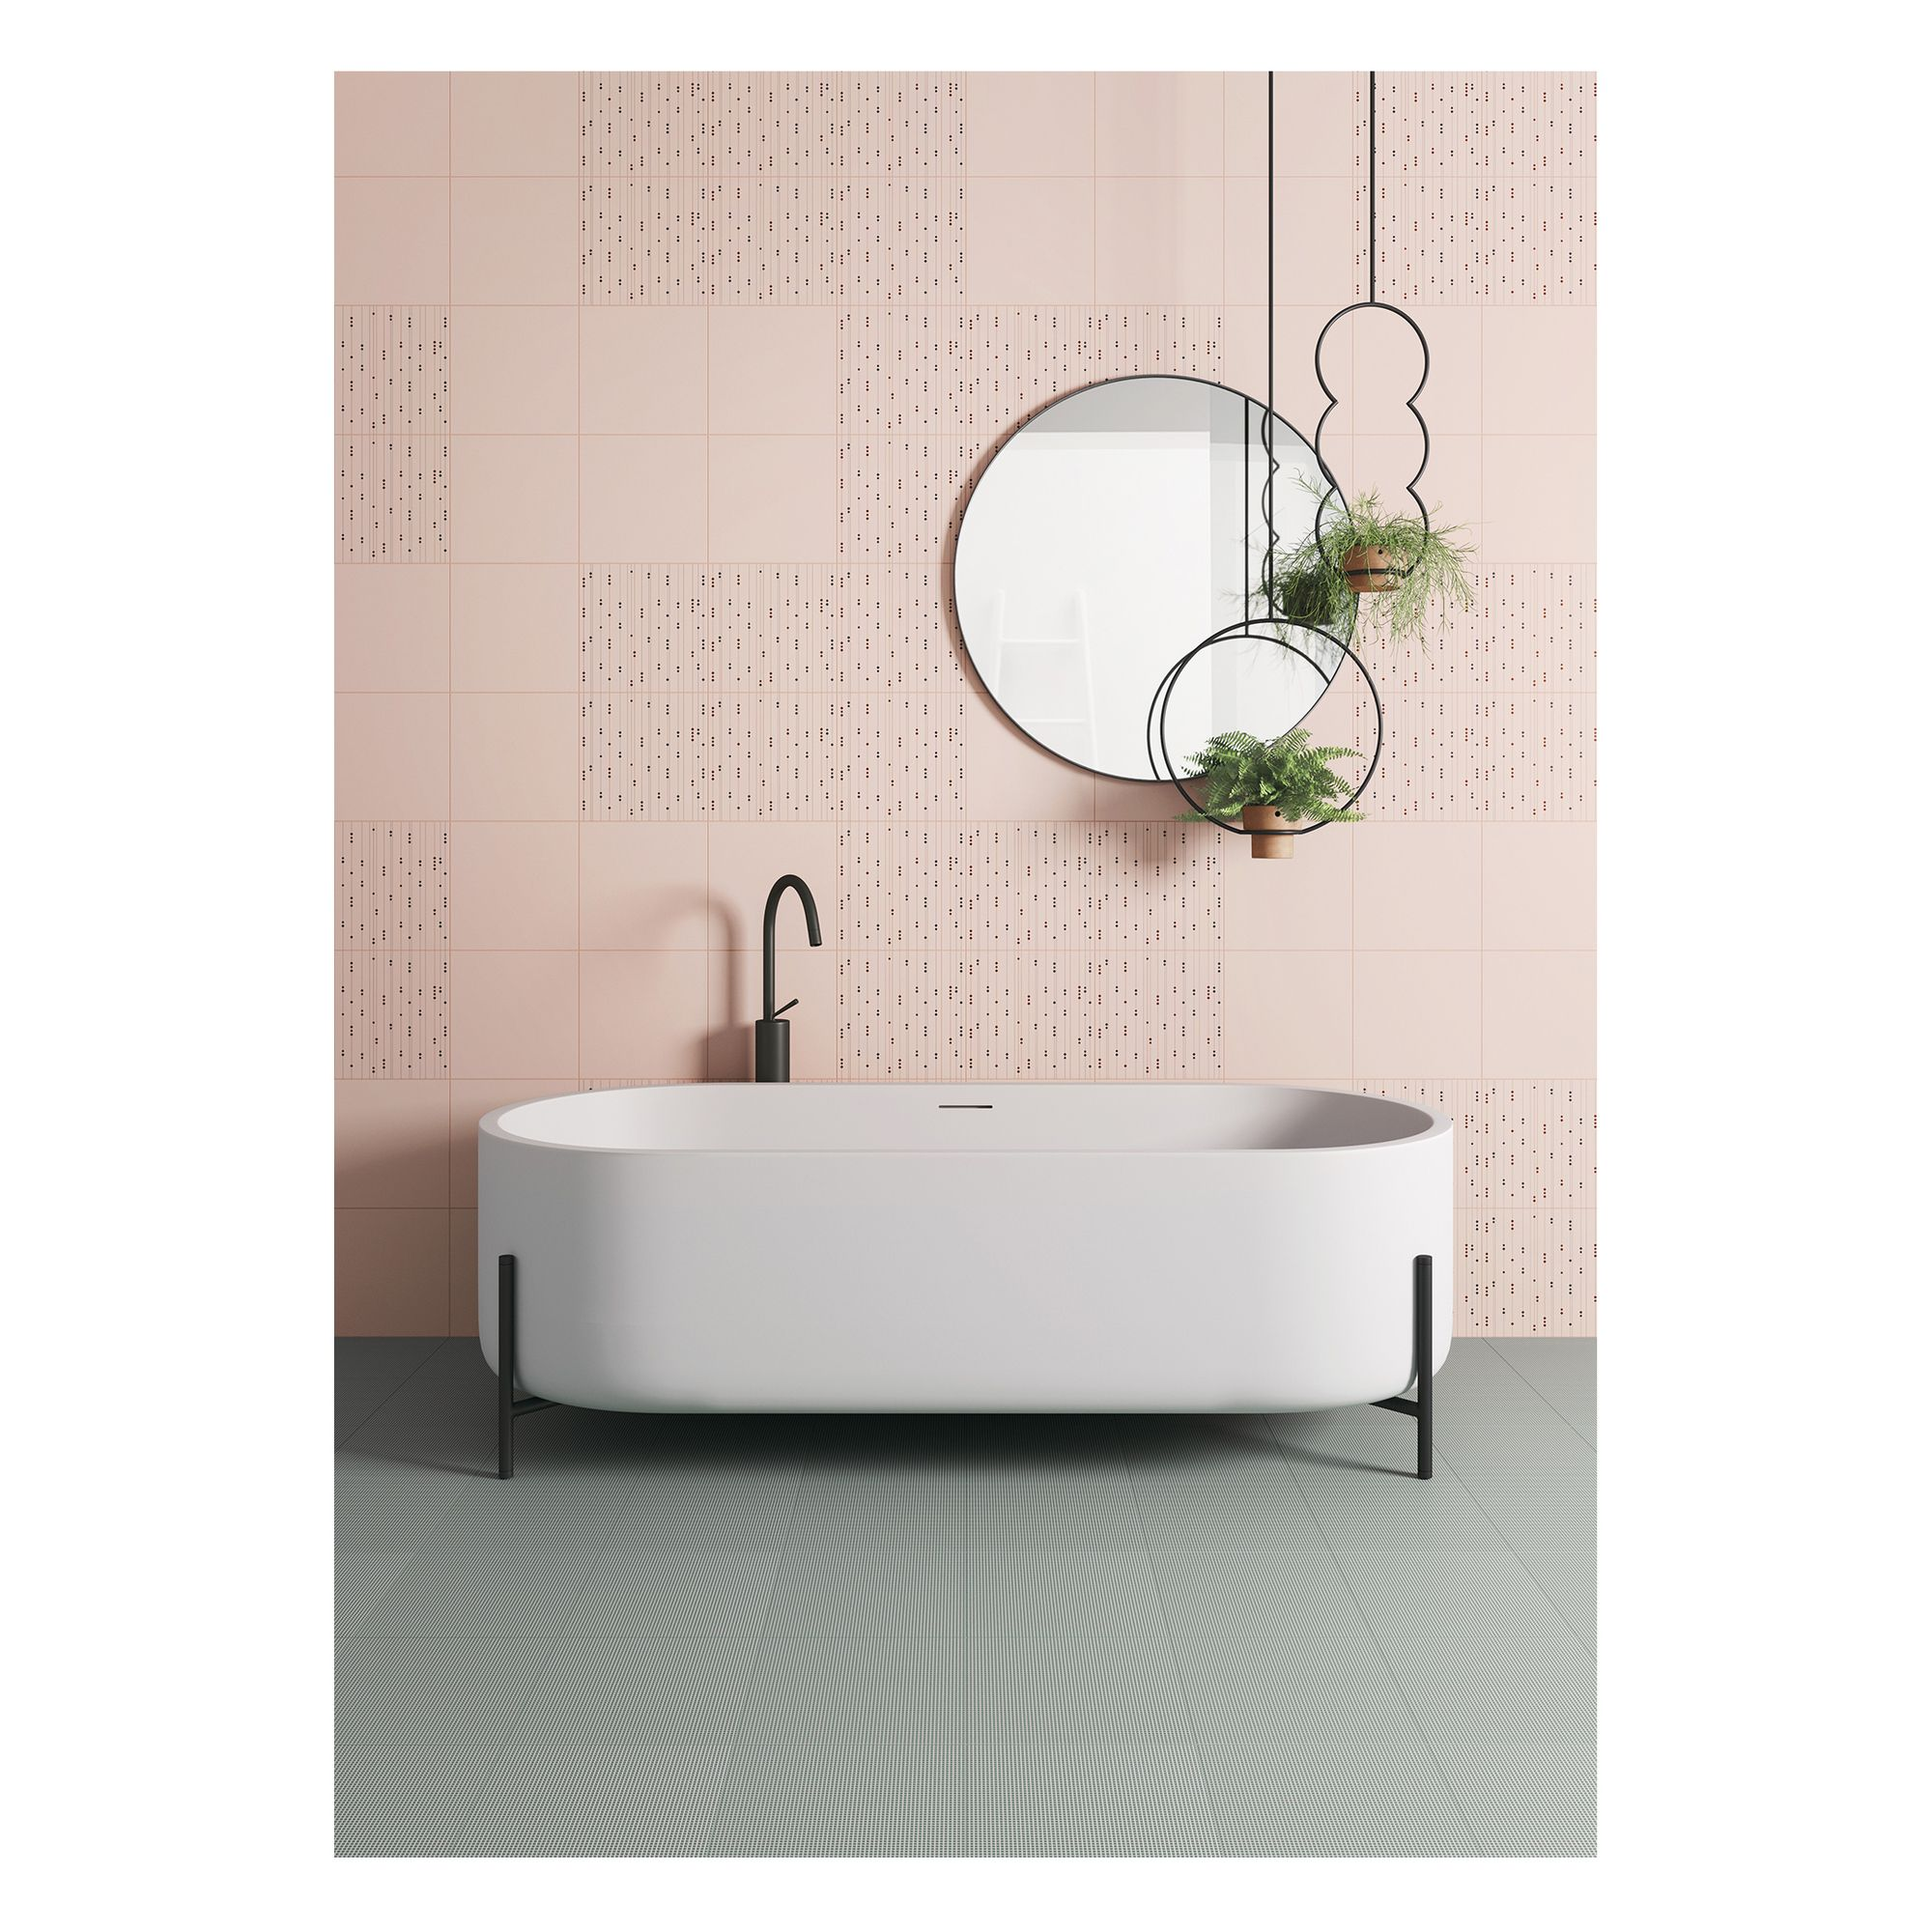 Tiles On Paper Laying Pattern 4 Ceramic Tiles Ceramicavogue Confetti And Graph Collection Ba Bathroom Interior Bathtub Design Beautiful Bathroom Designs